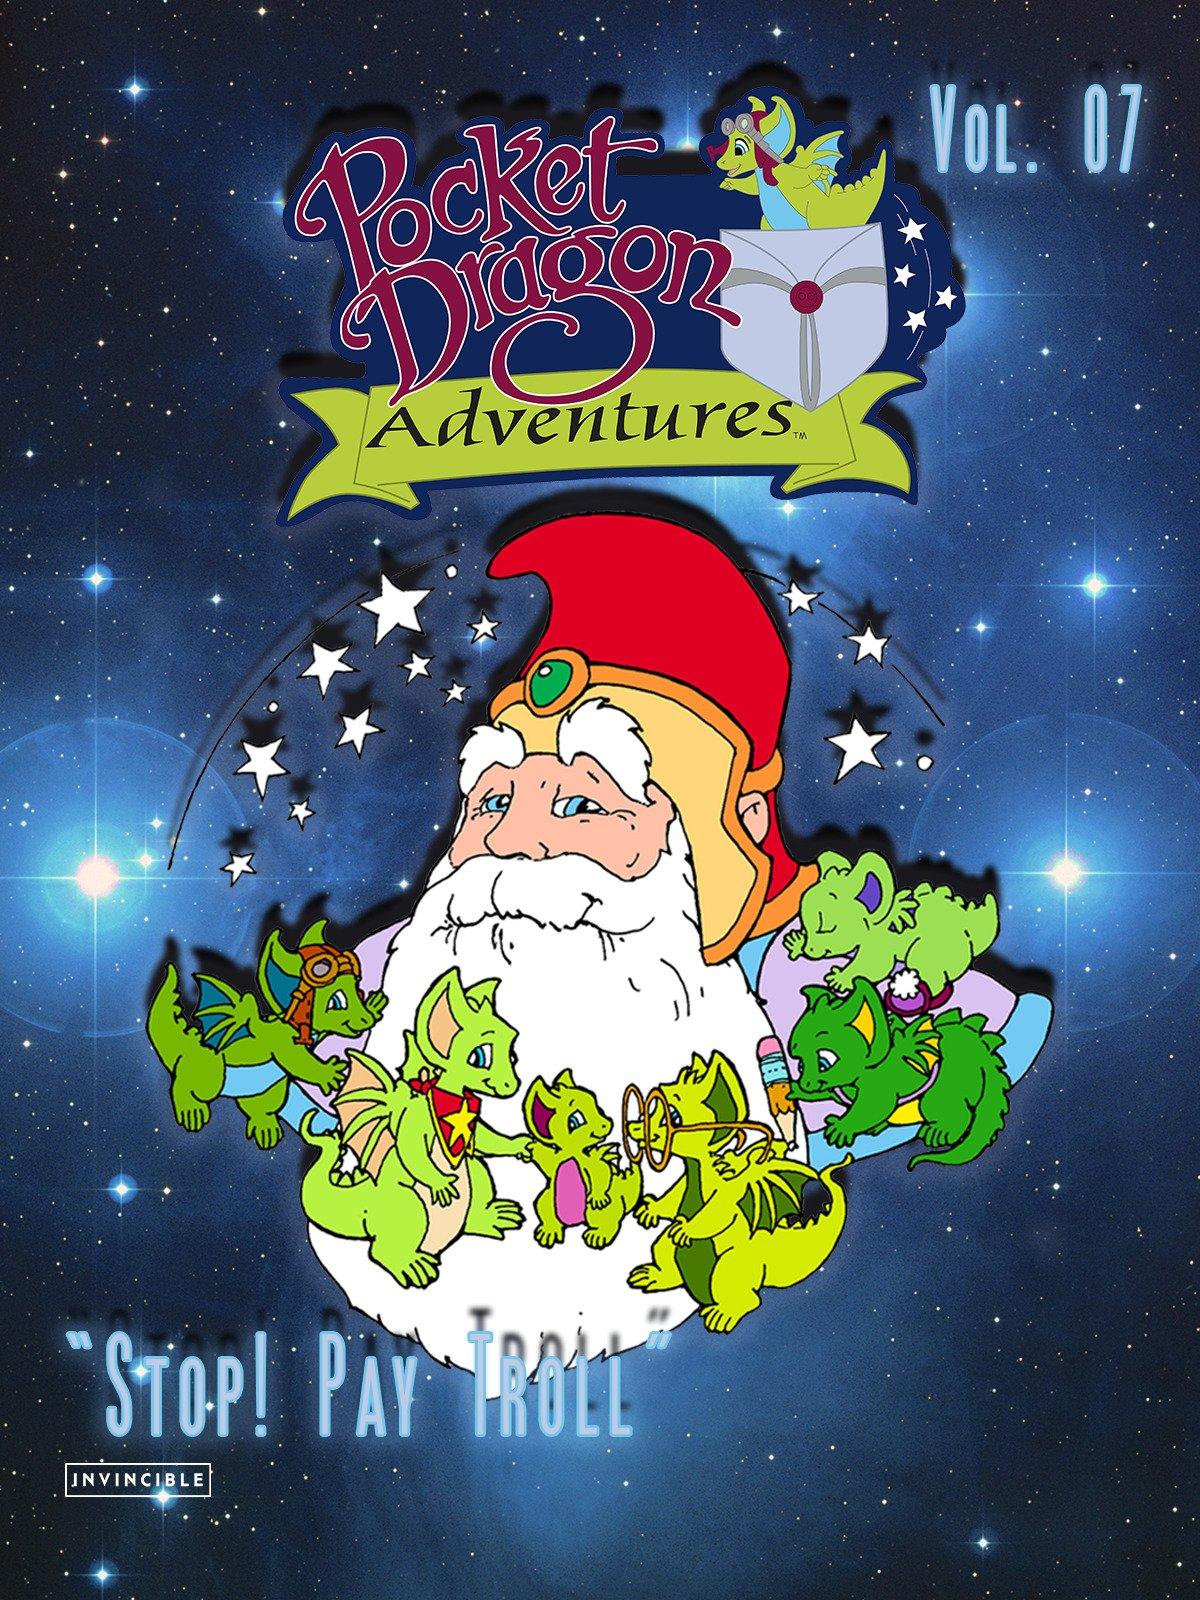 Pocket Dragon Adventures Vol. 07Stop! Pay Troll!